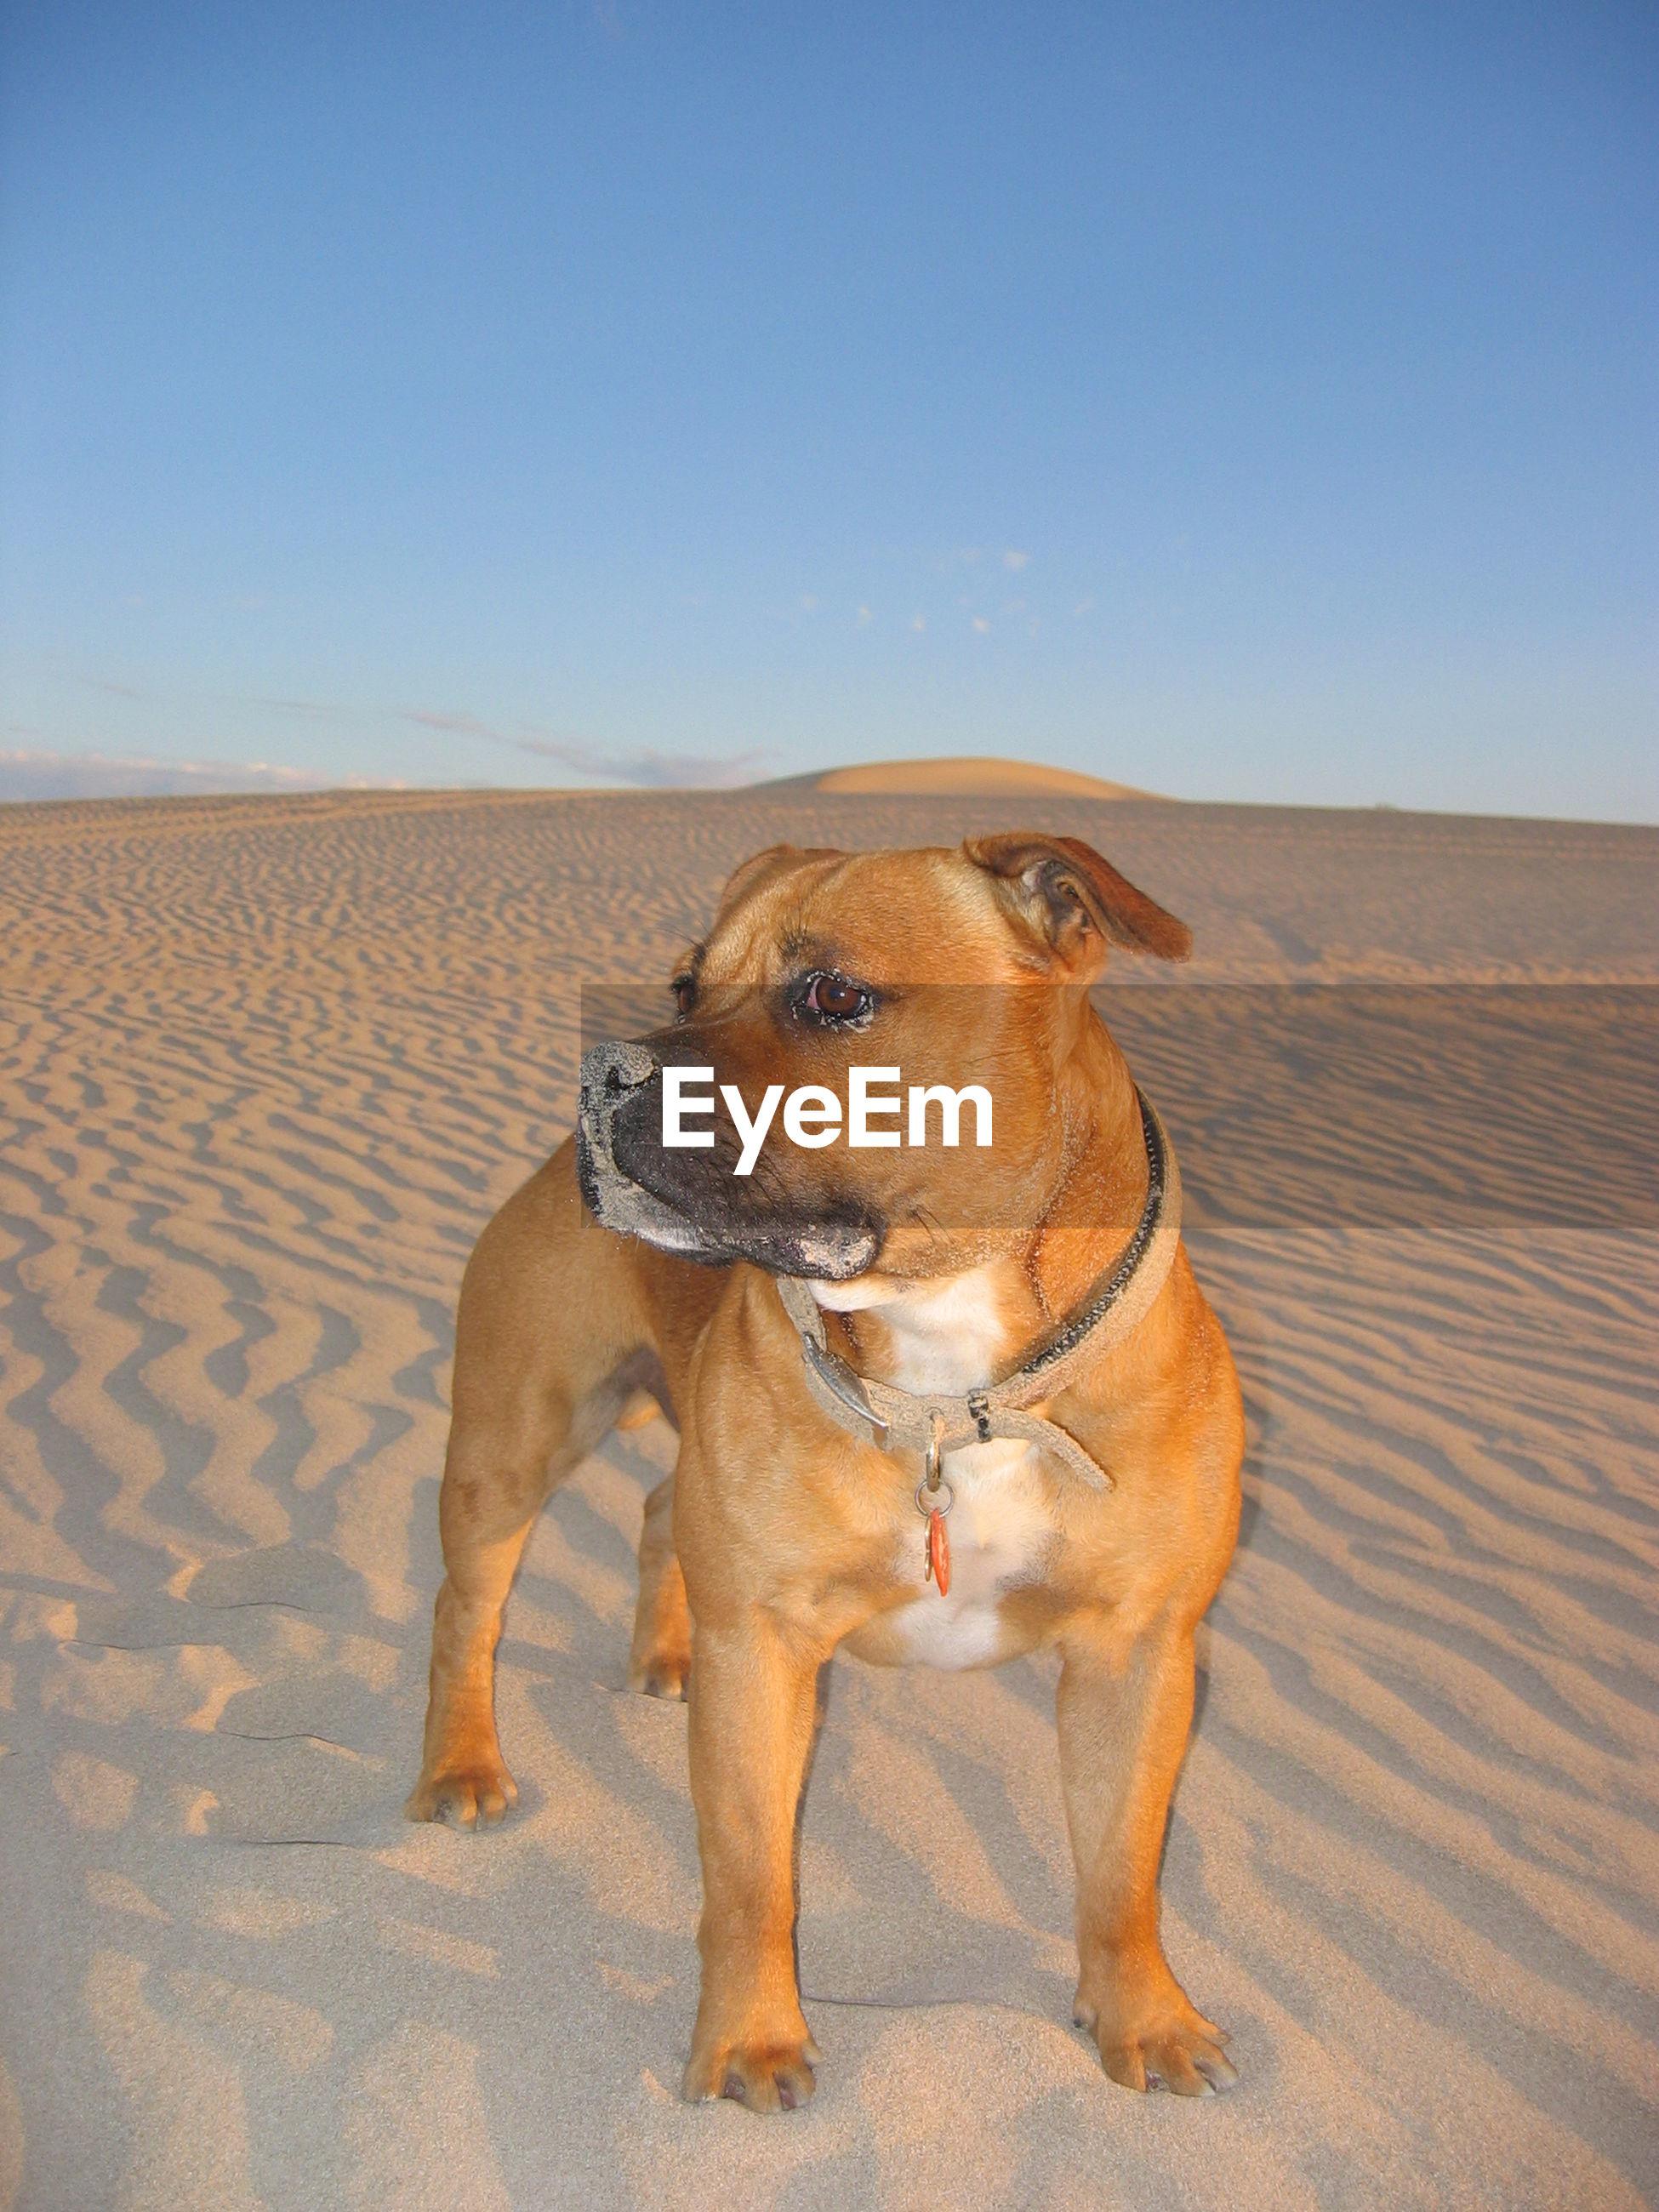 DOG STANDING ON SAND DUNE